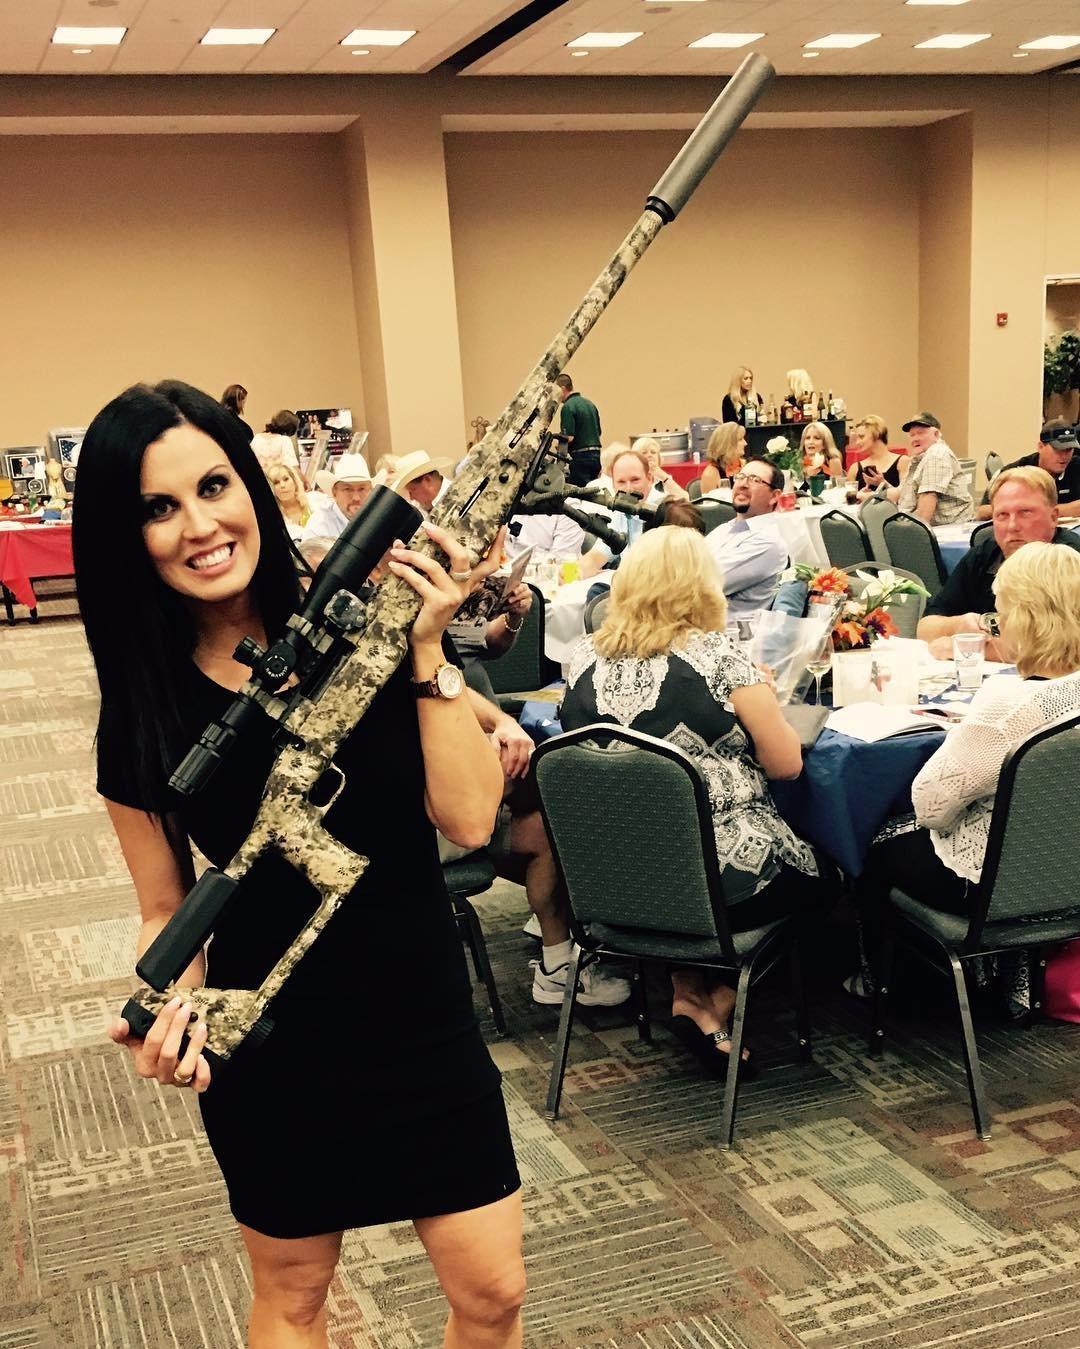 Jennifer Brennan holding a gun in an Instagram Picture